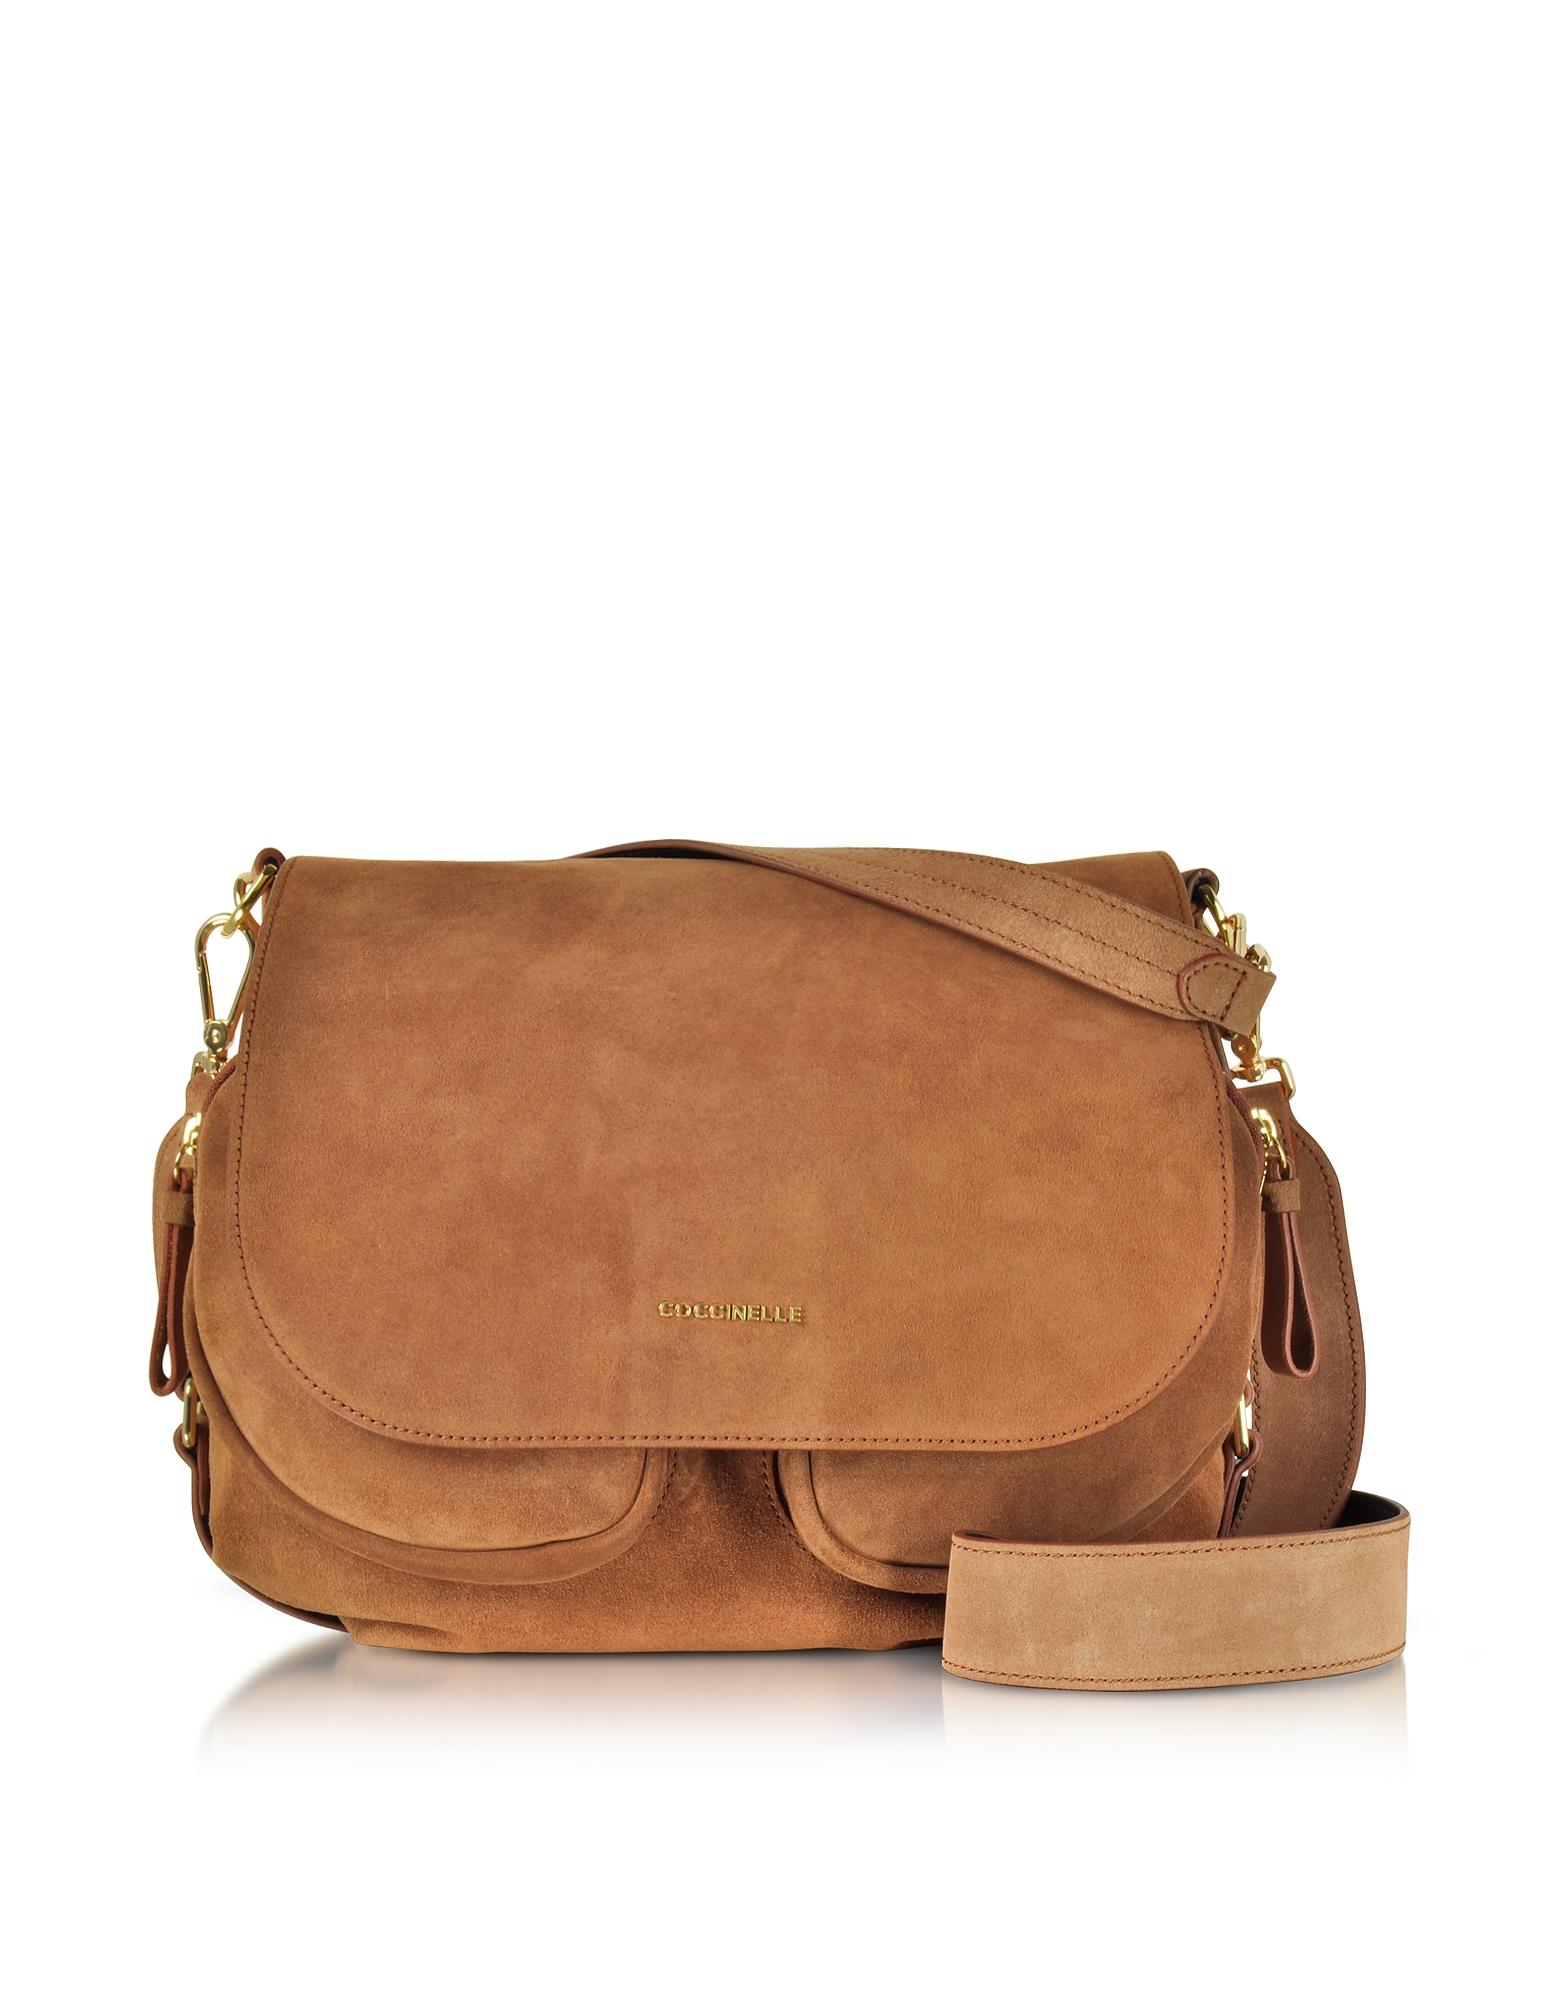 Coccinelle Handbags, Janine Suede Shoulder Bag